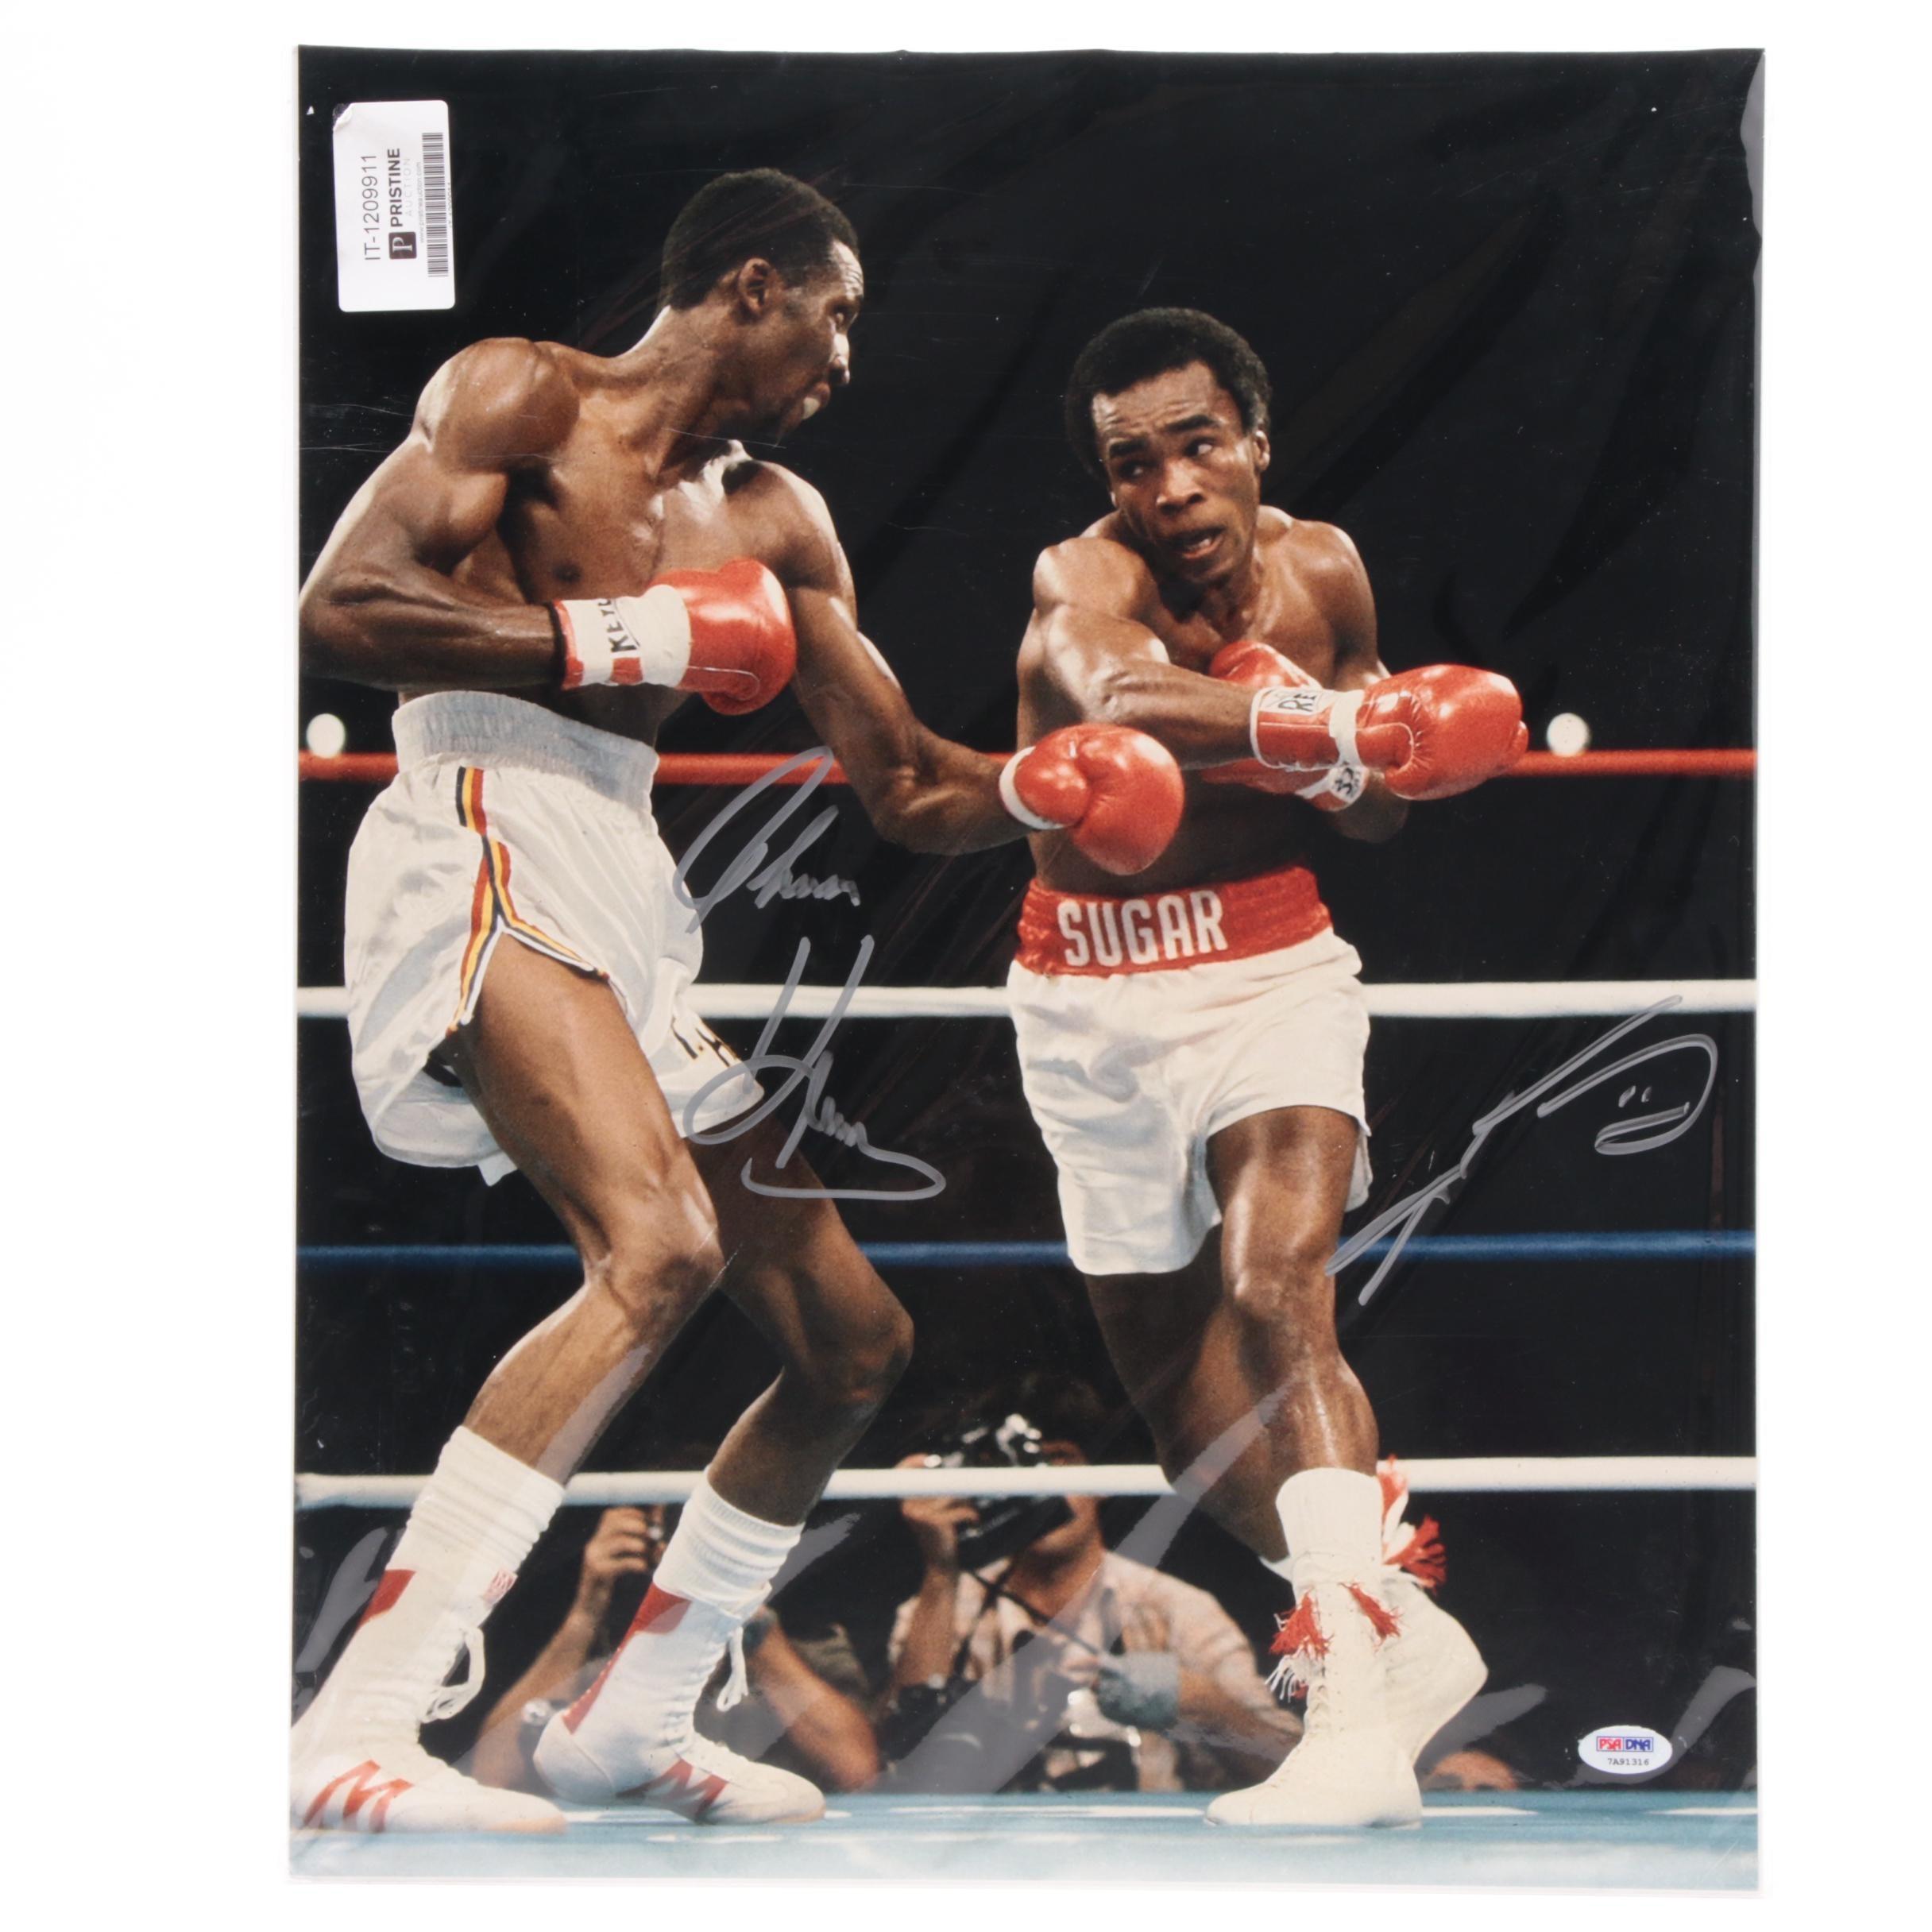 Tommy Hearns and Sugar Ray Leonard Signed Large Boxing Photo Print PSA/DNA COA